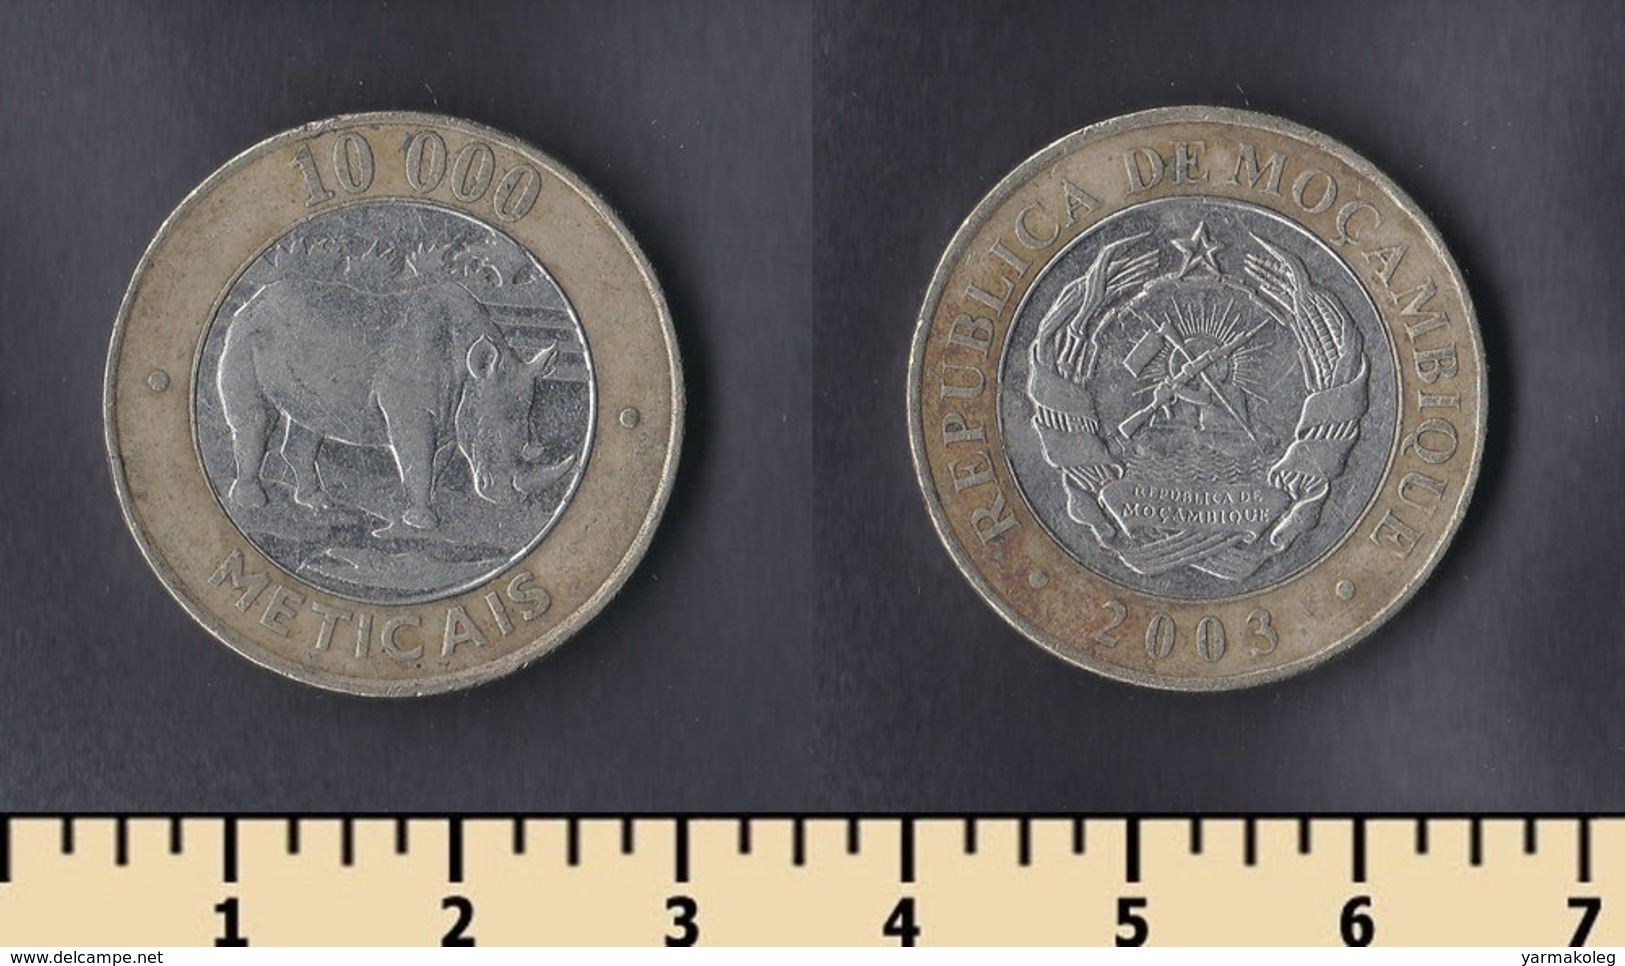 Mozambique 10000 Meticais 2003 - Mosambik